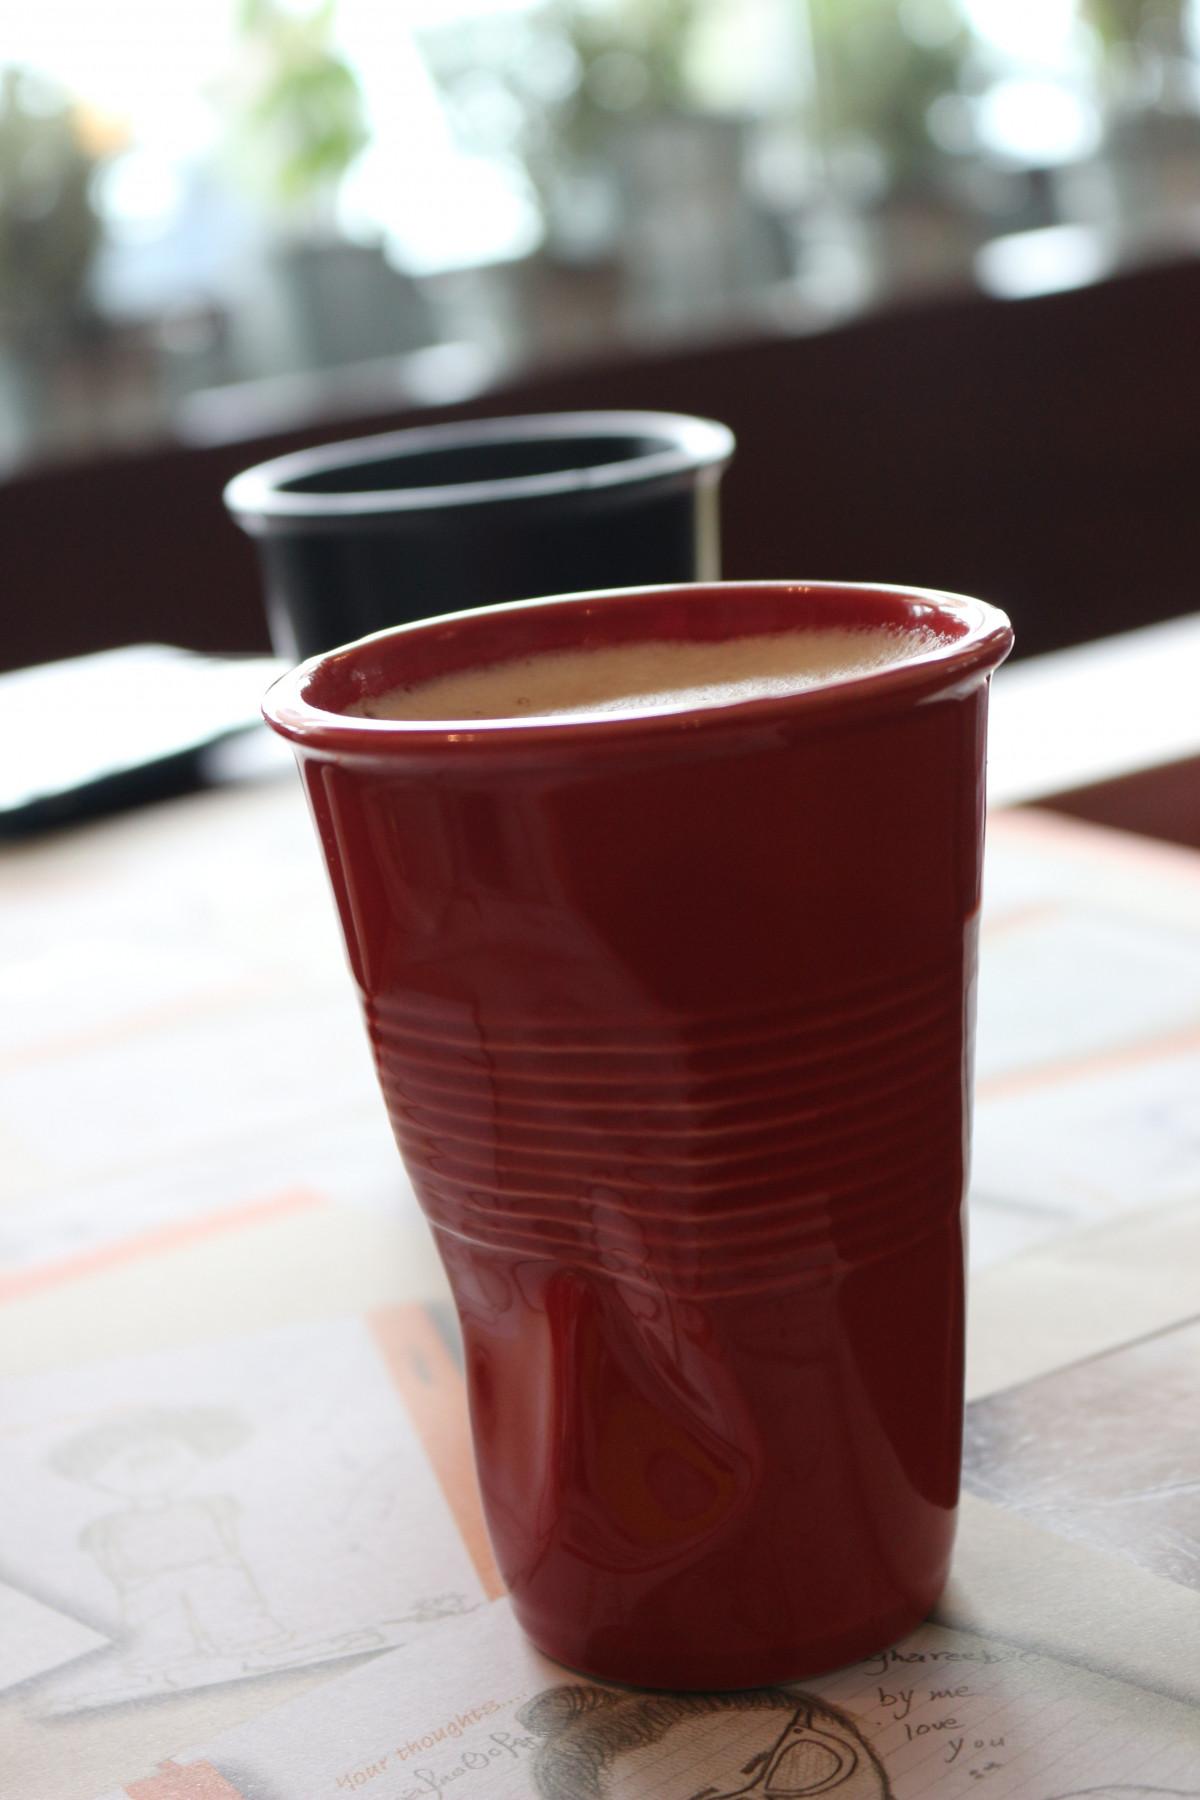 free images : table, liquid, cafe, coffee, wood, white, retro, tea